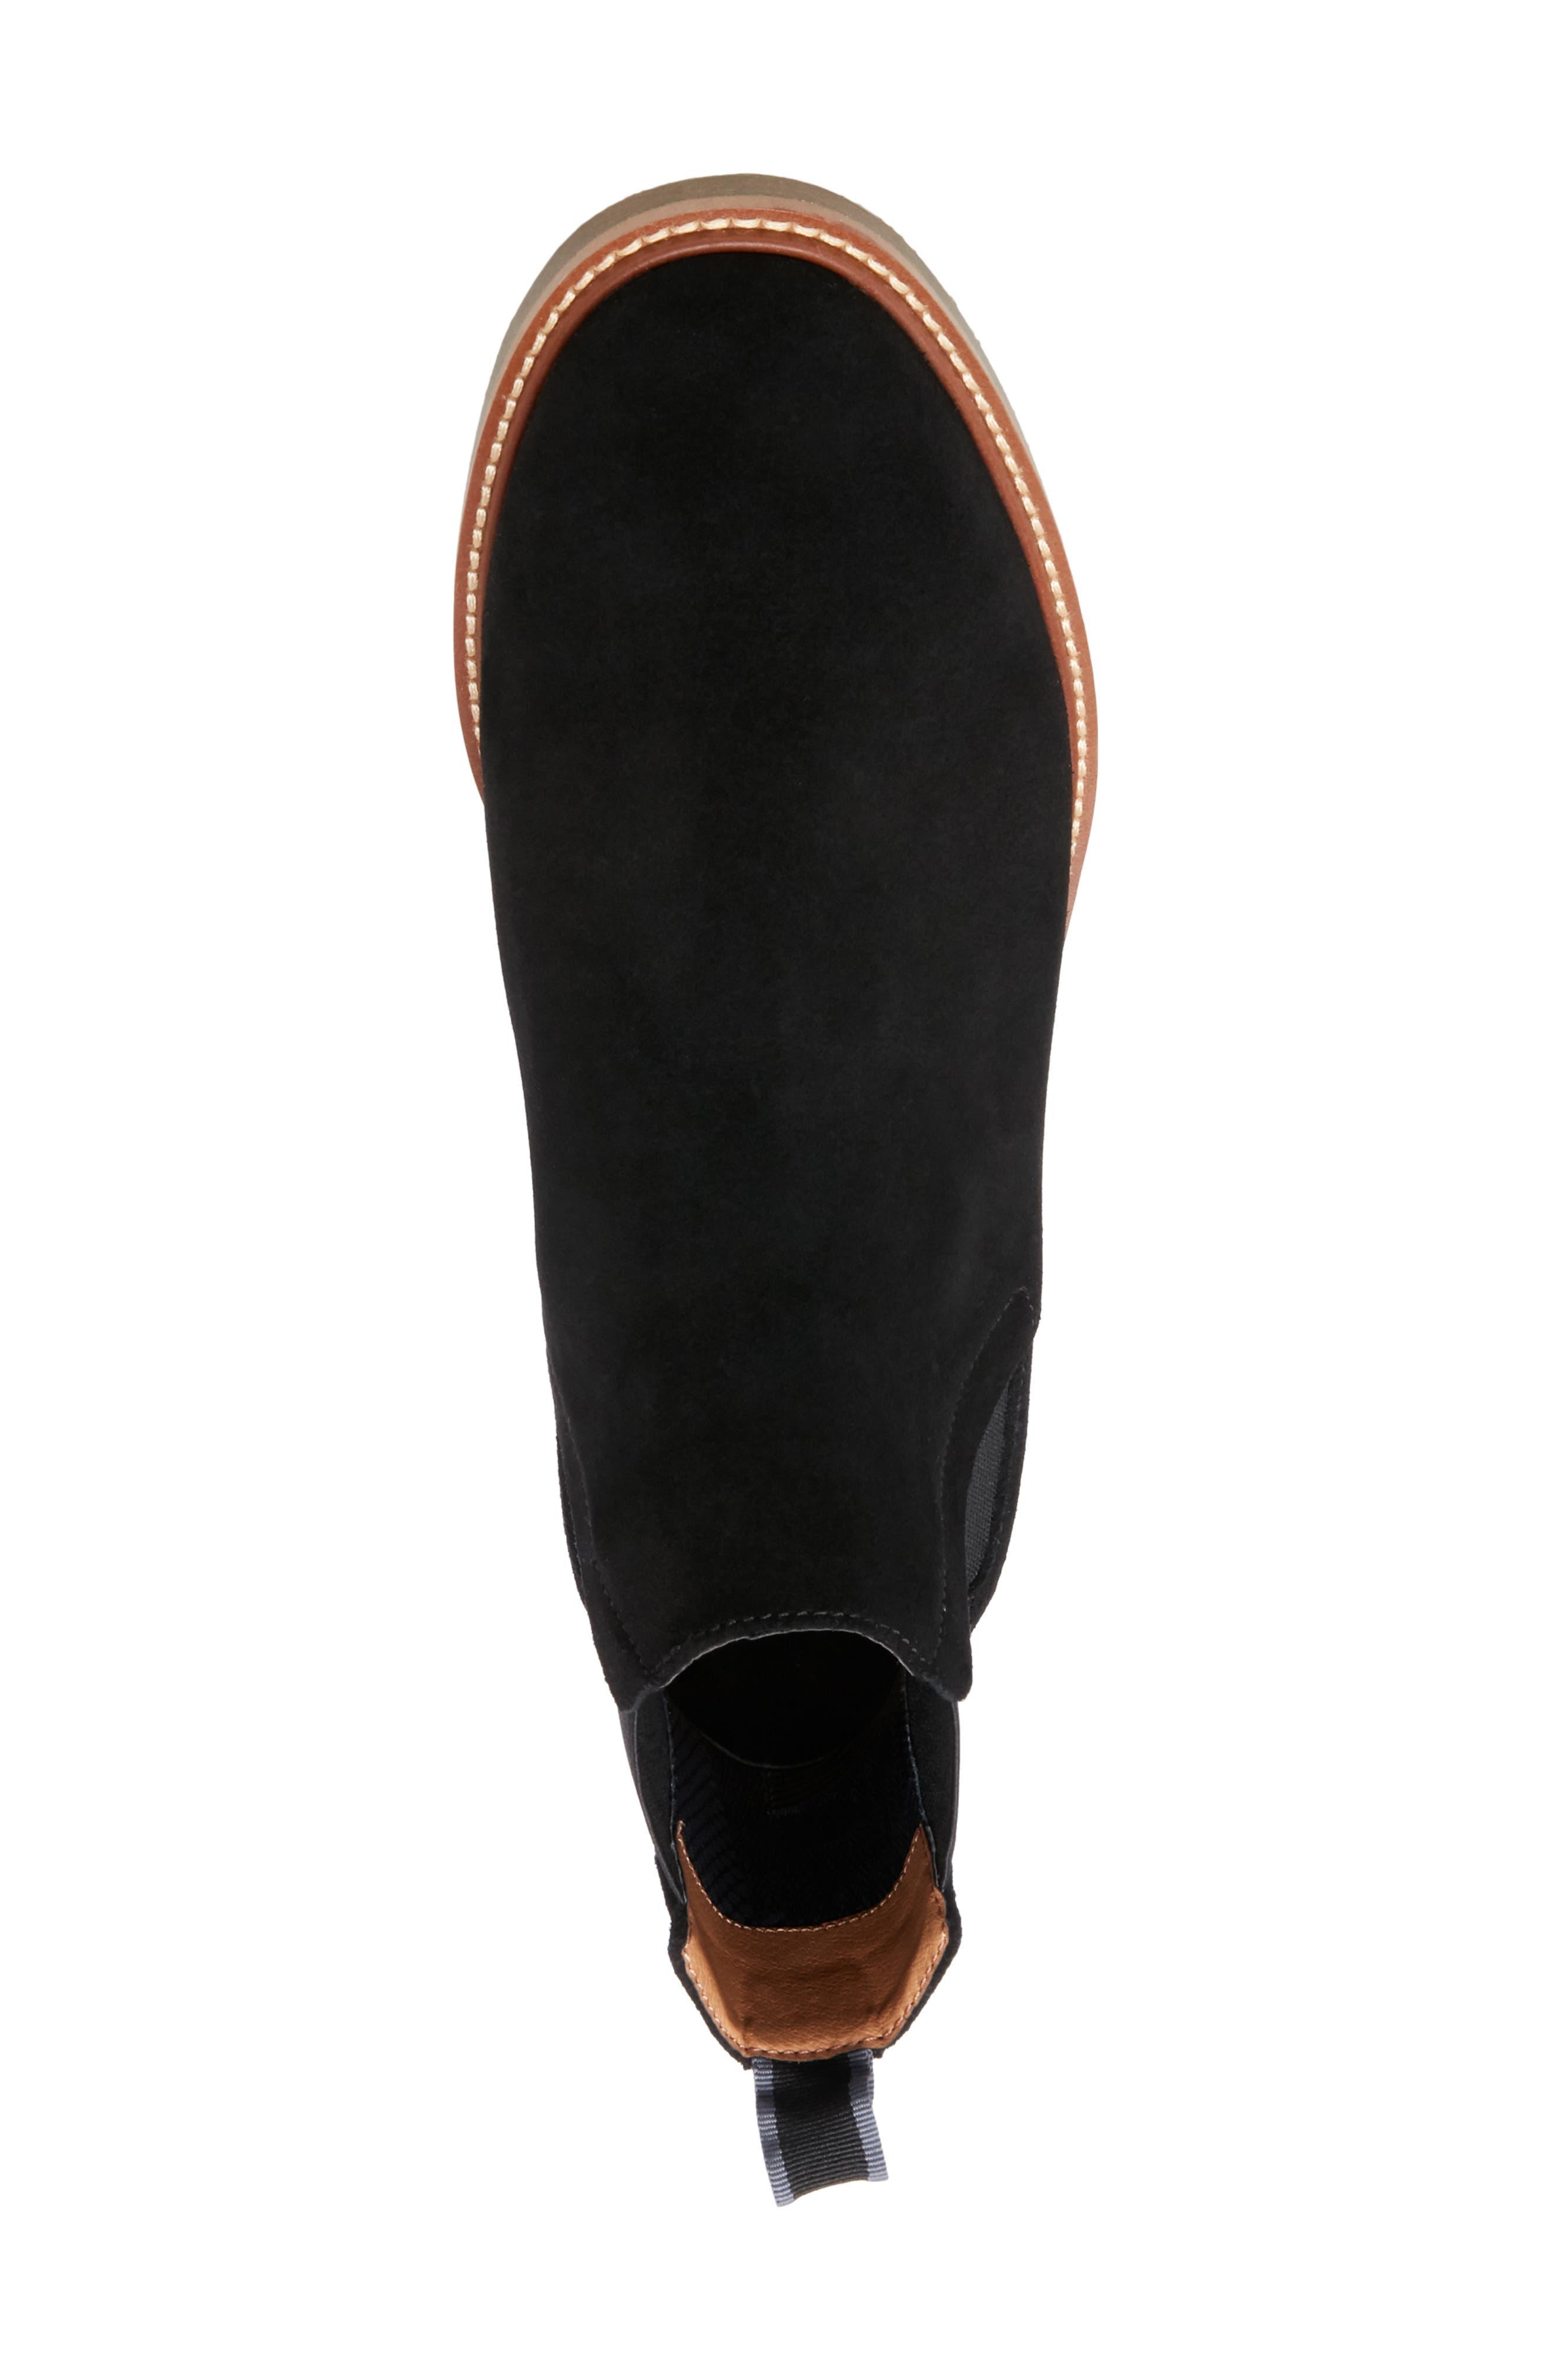 Highlyte Textured Chelsea Boot,                             Alternate thumbnail 5, color,                             006